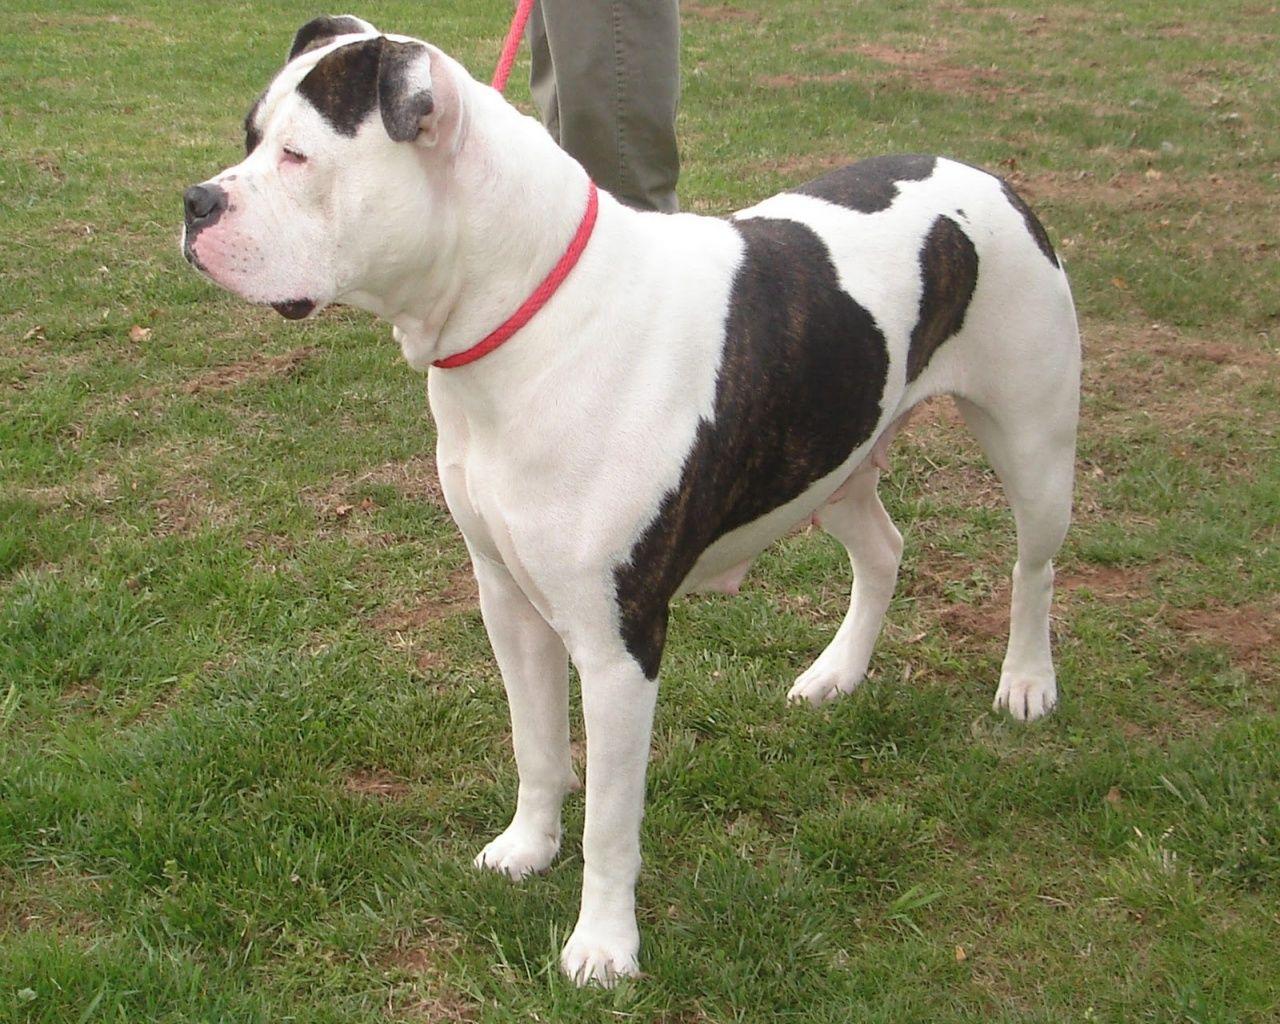 bulldog breeds American Bulldog Breed Australian